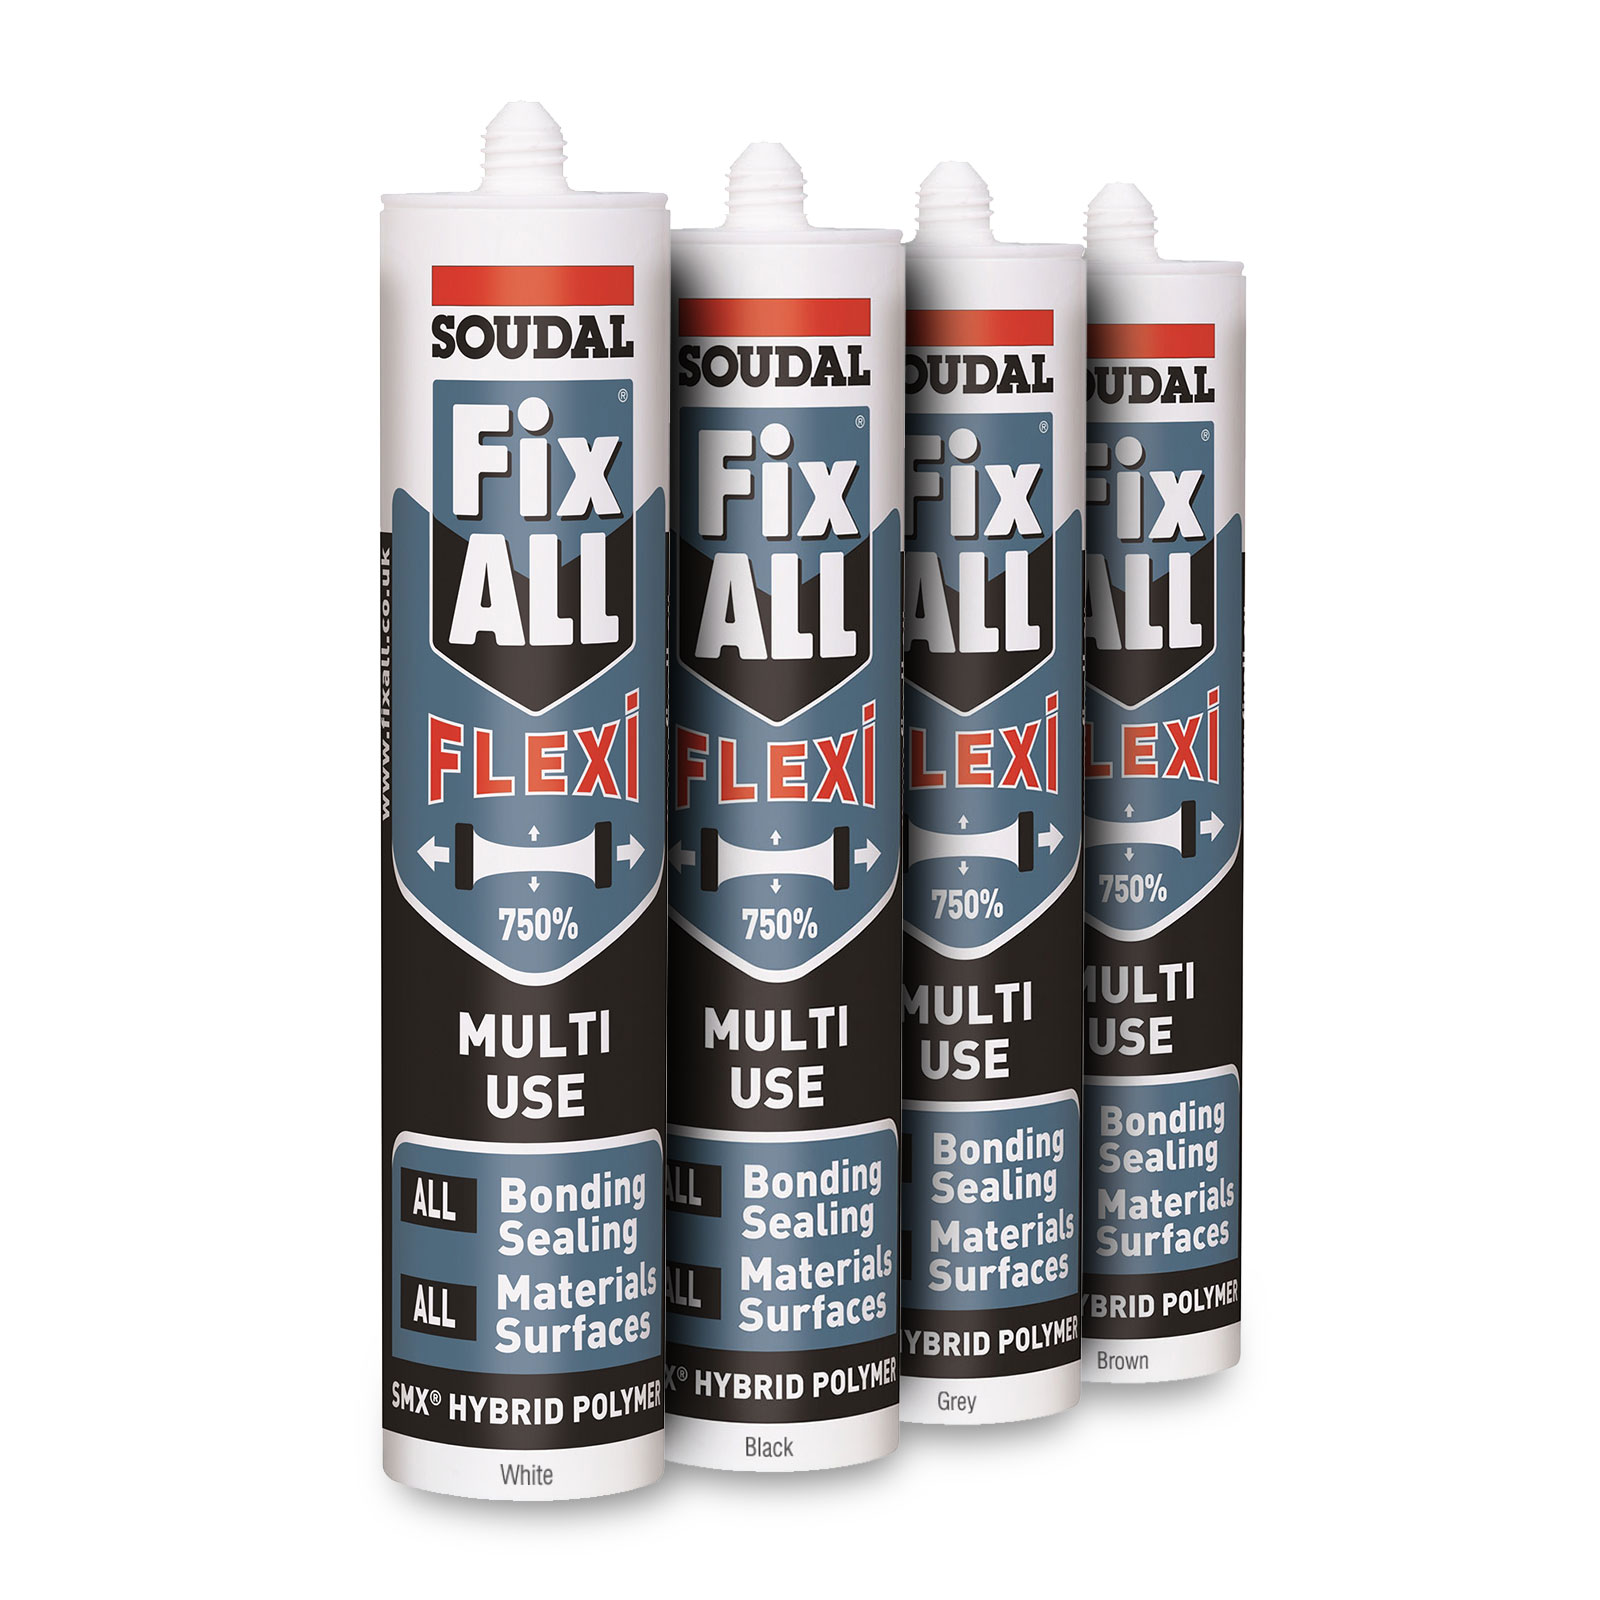 Black Soudal Fix All Flexi Sealant Amp Adhesive Neutral Smx